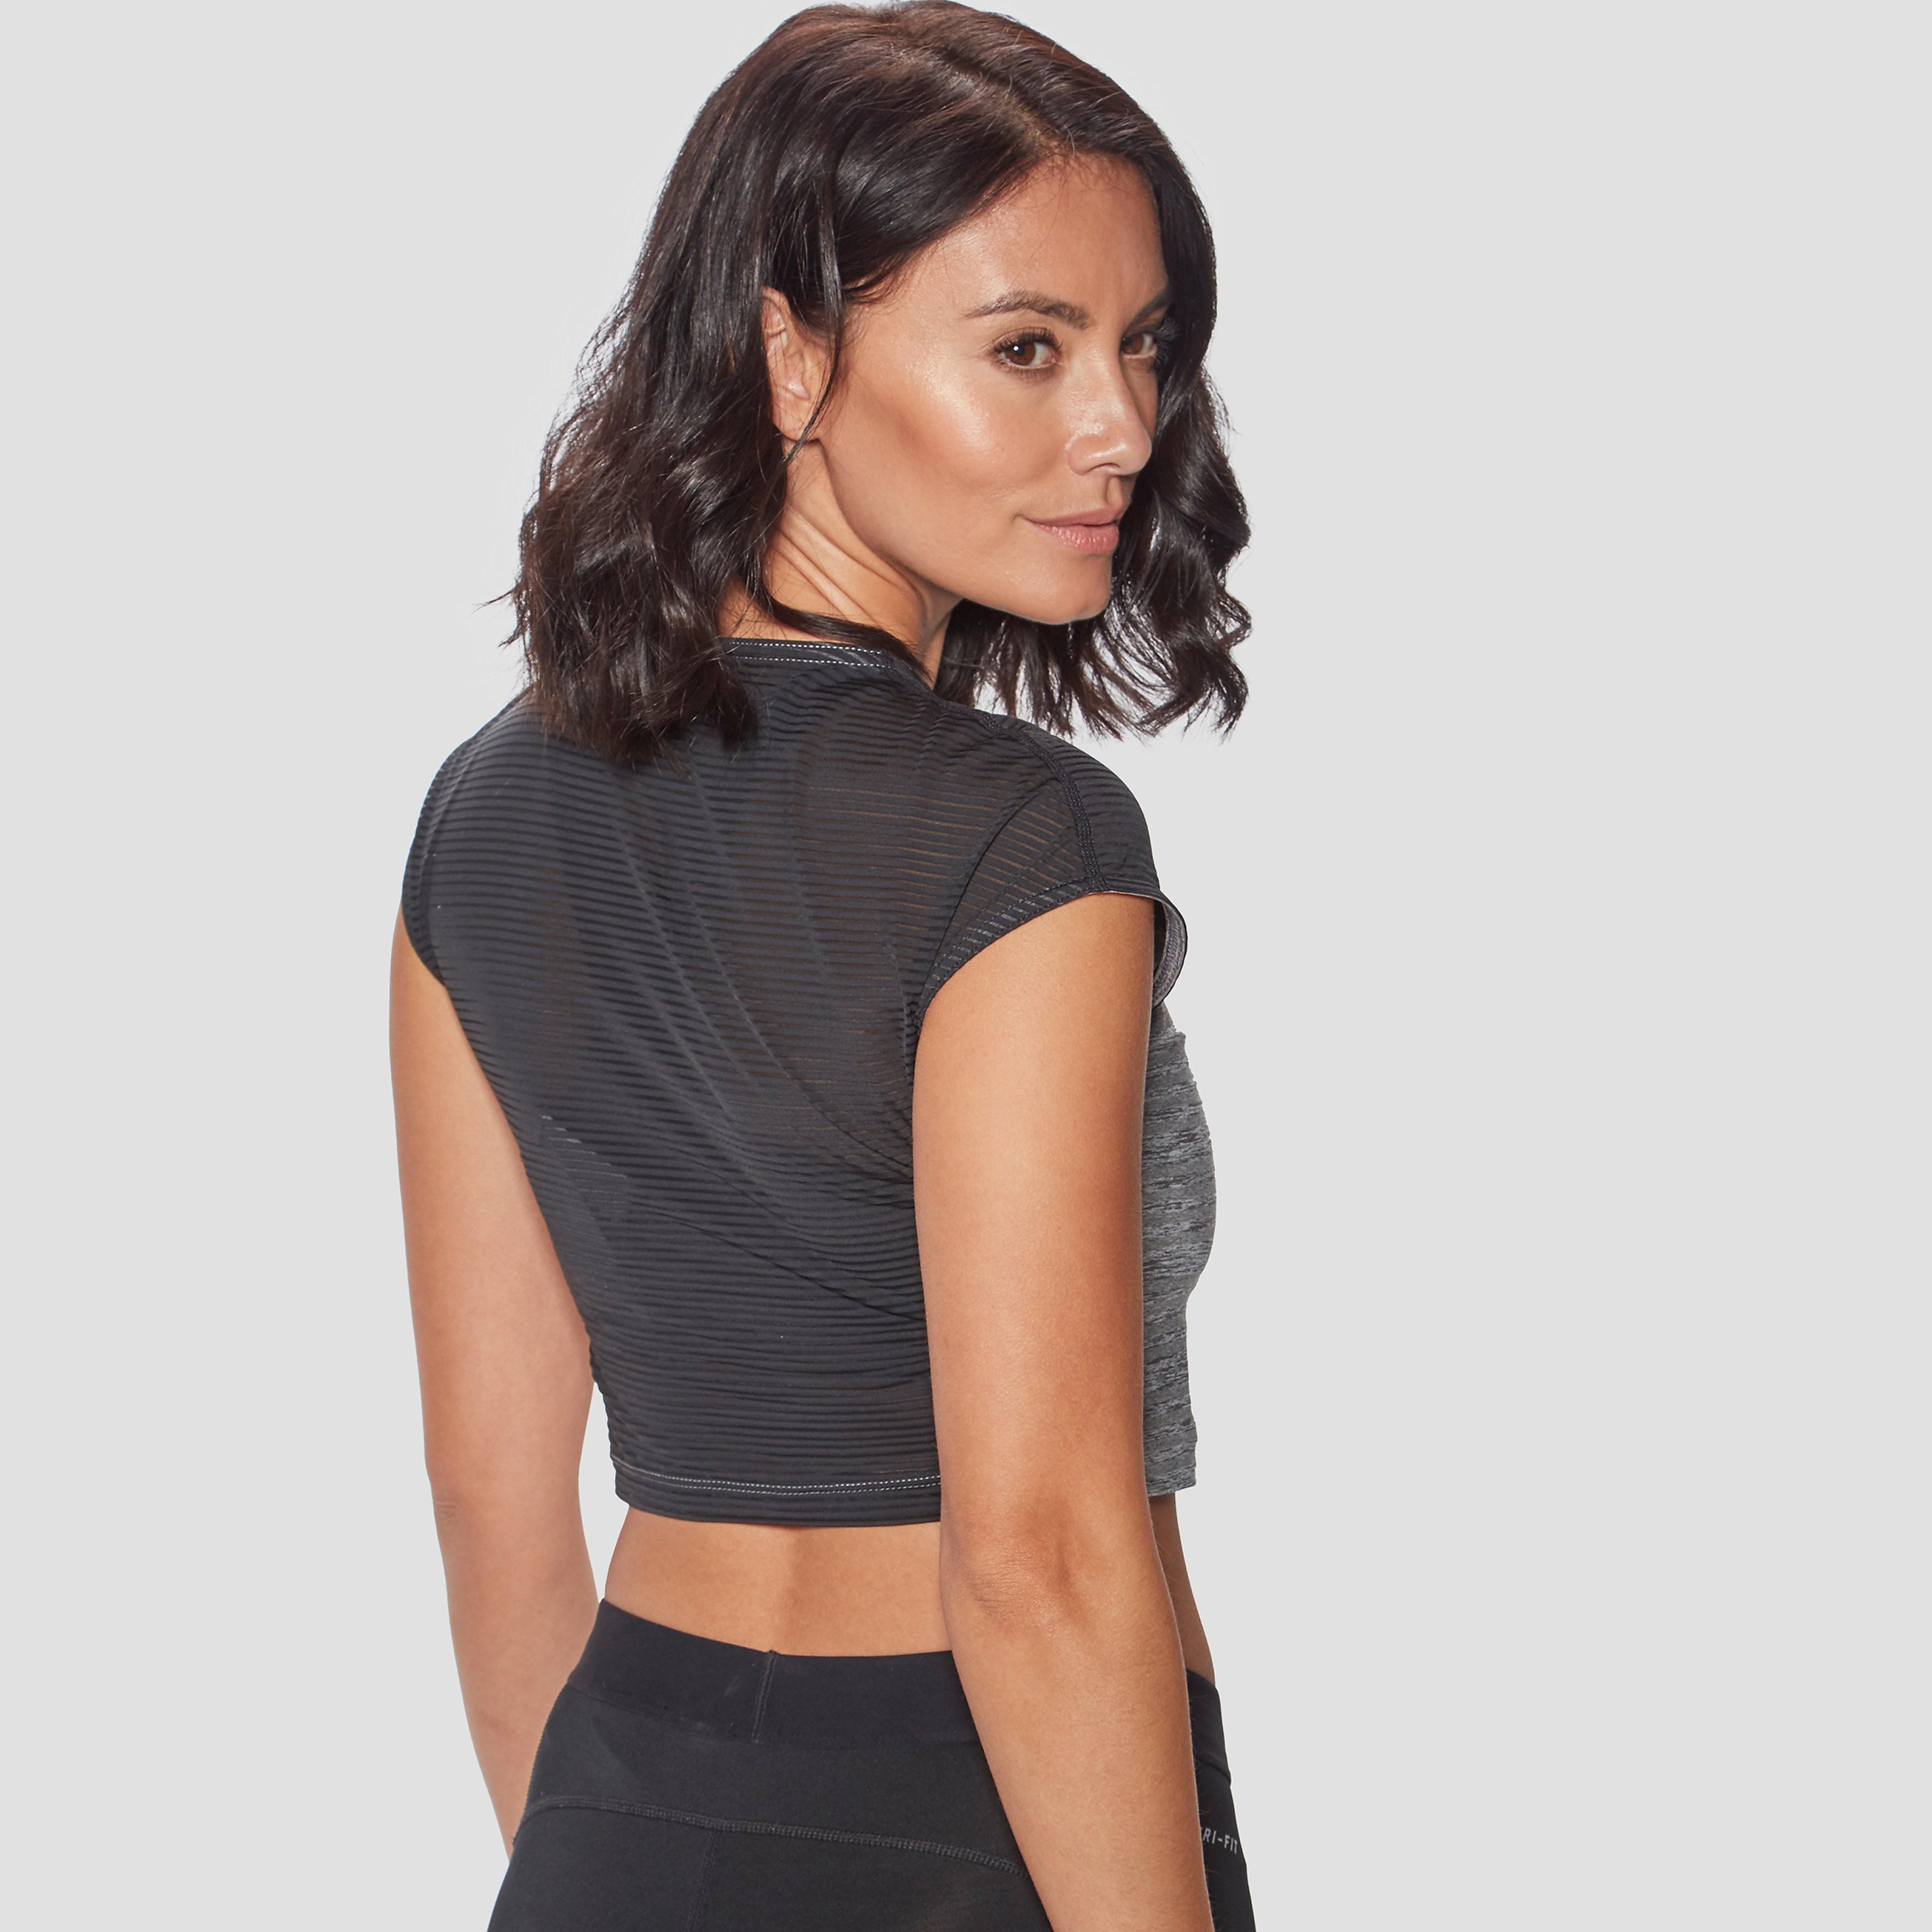 Nike Pro Cropped Women's Training Top